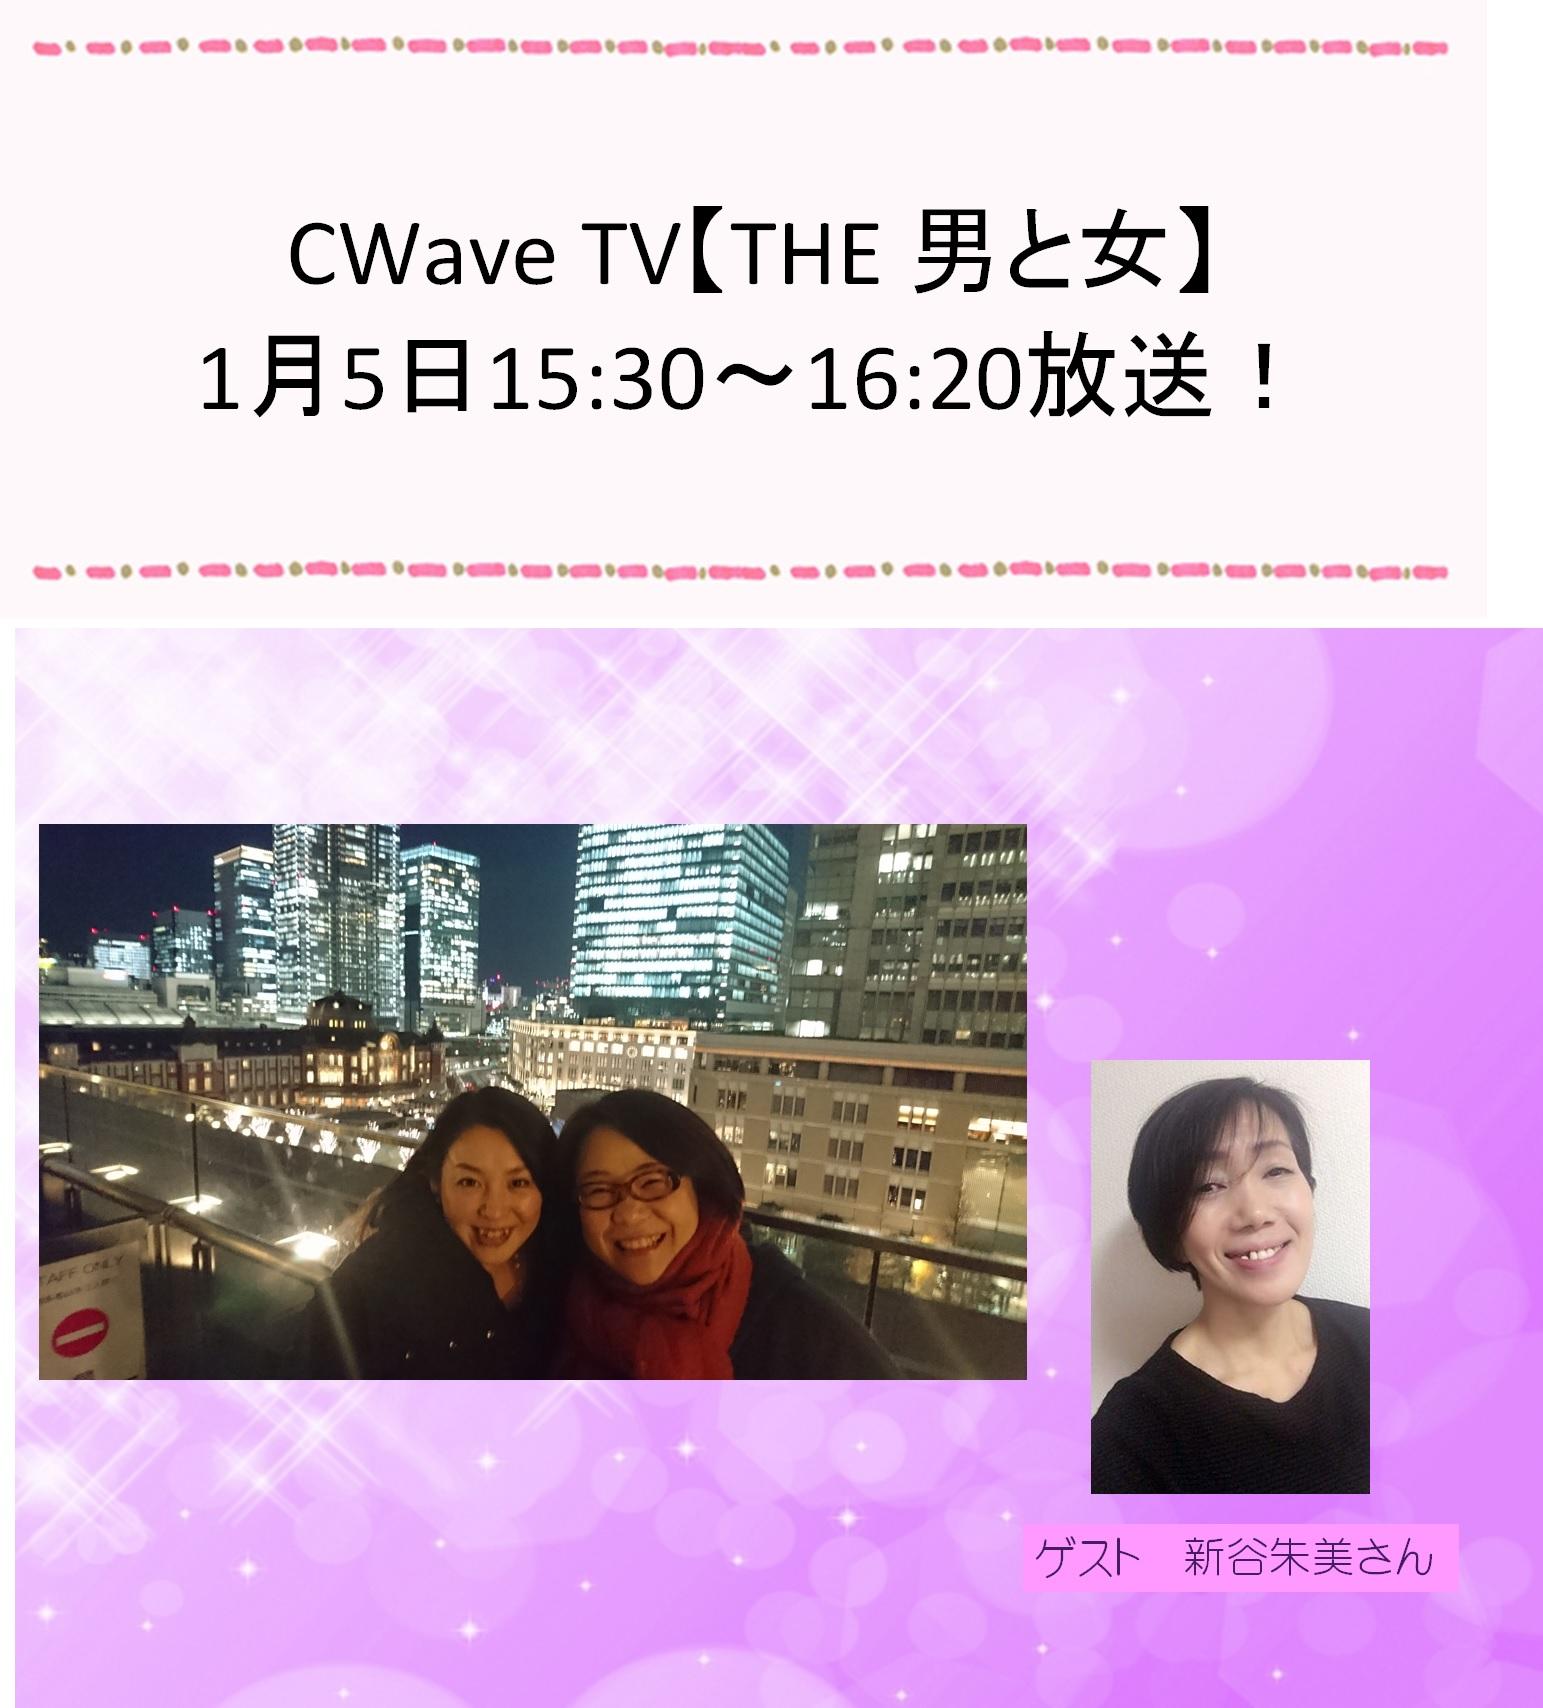 Cwave